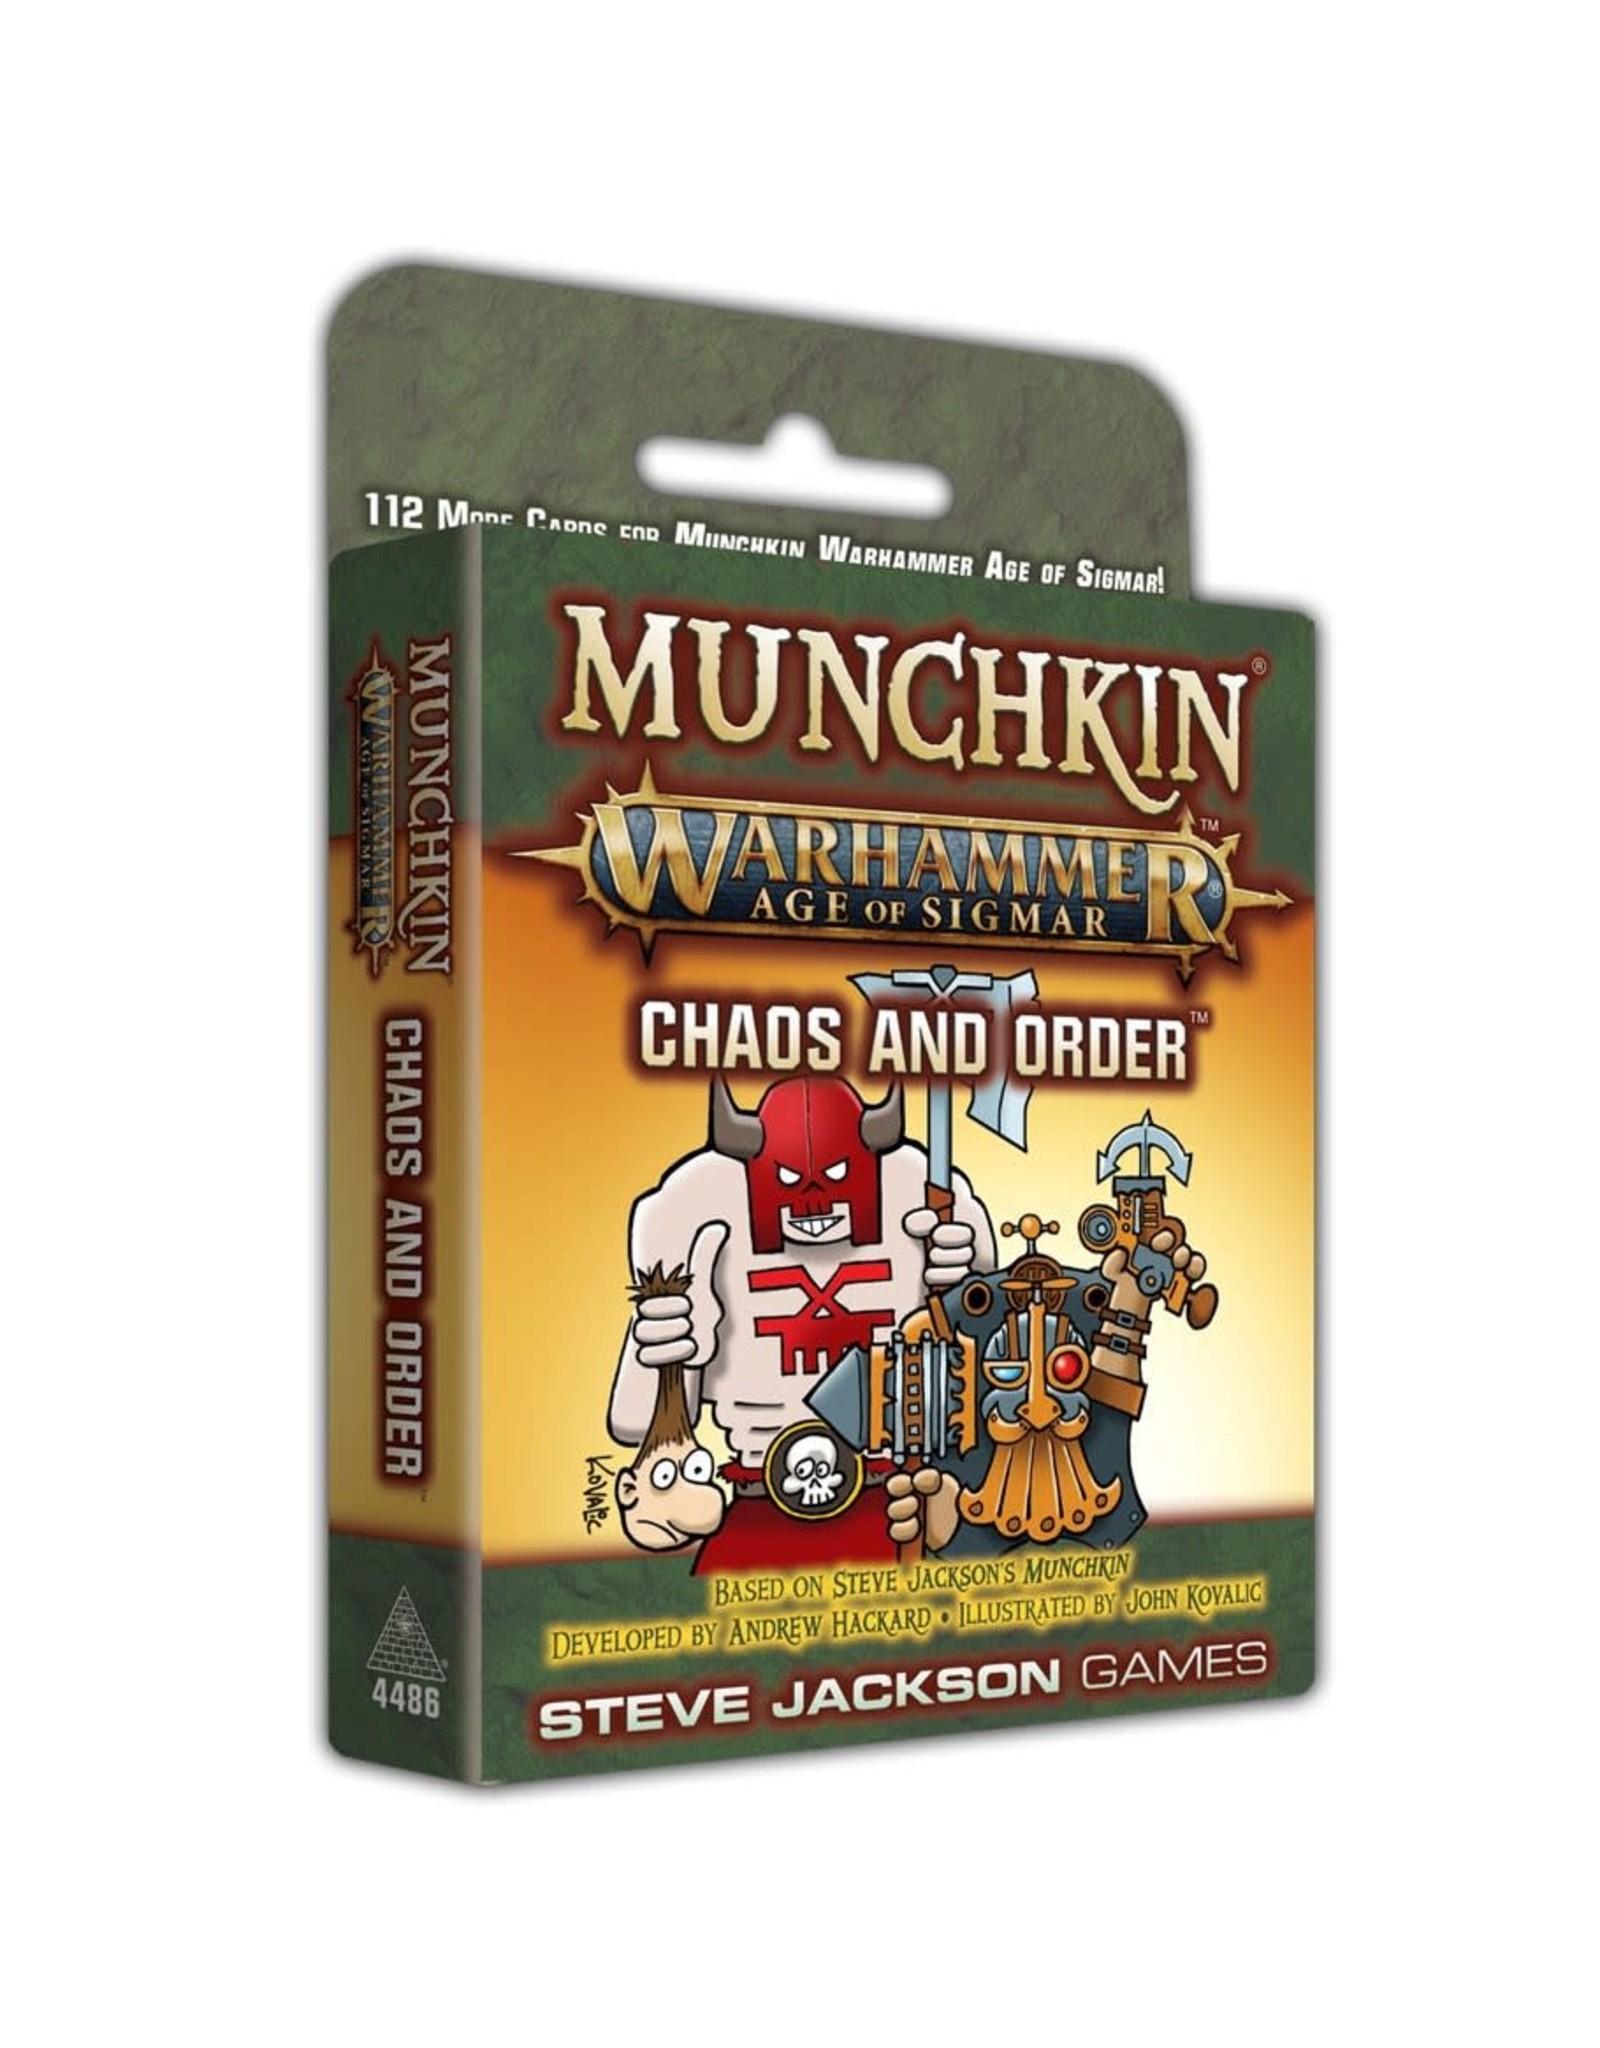 Steve Jackson Games Munchkin: Warhammer Age of Sigmar - Chaos and Order